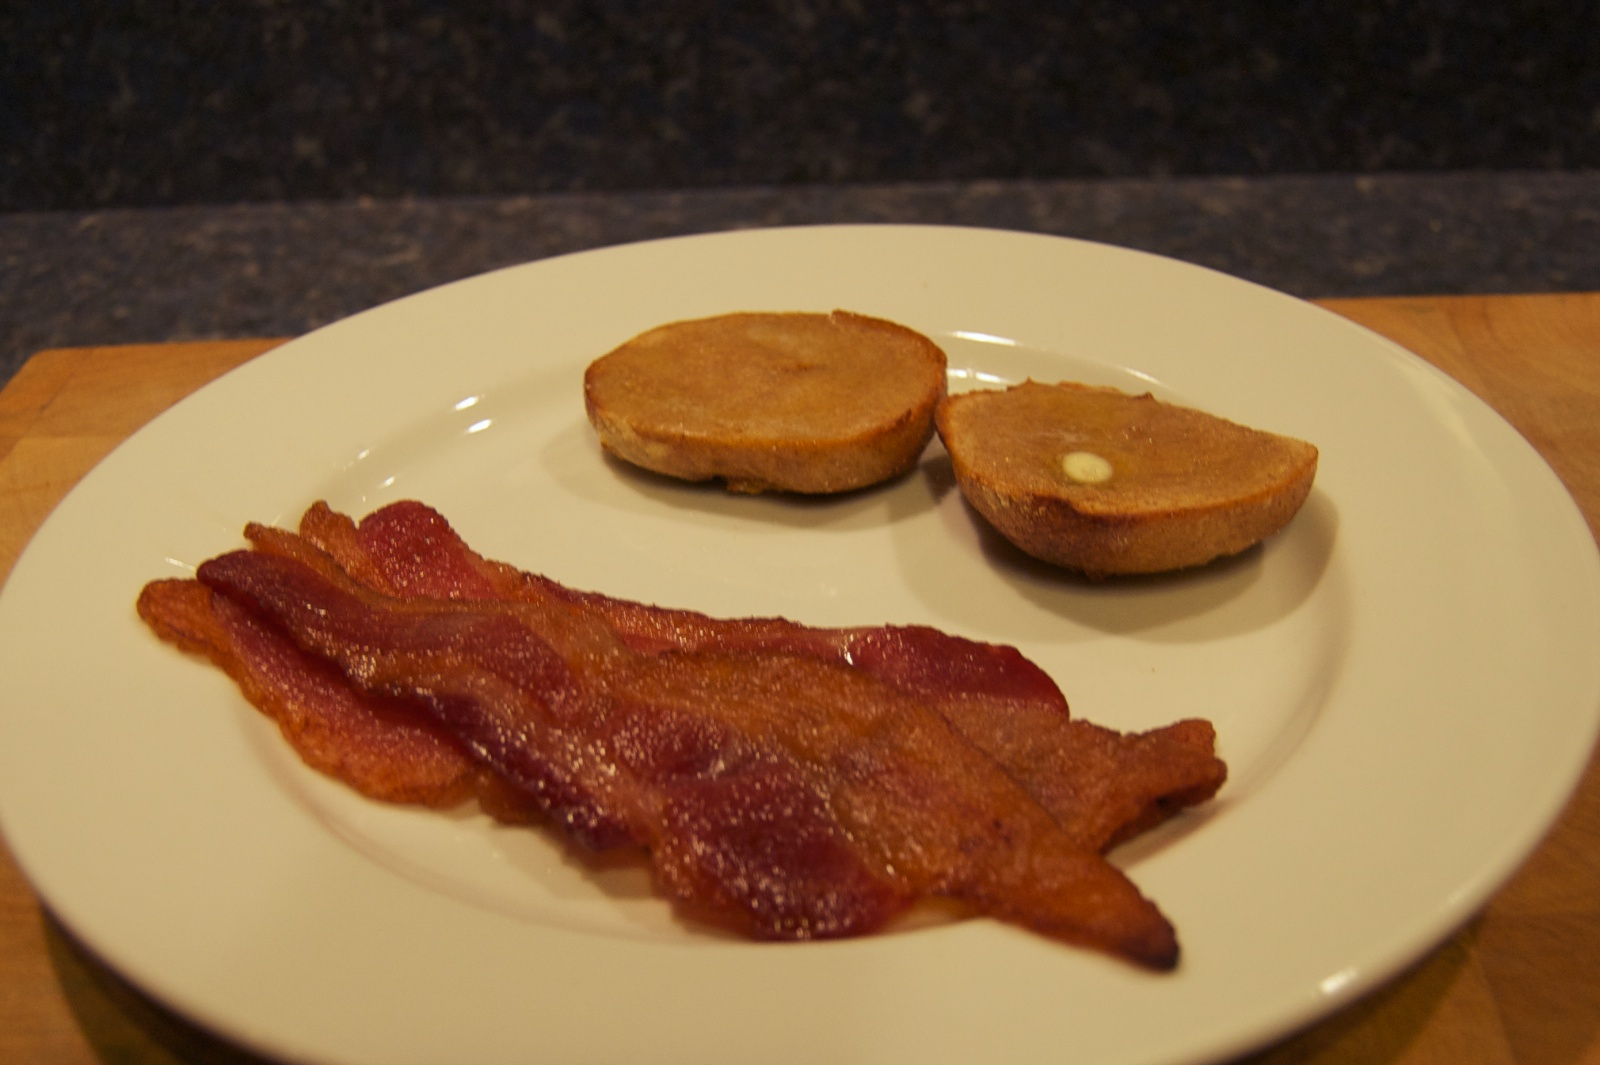 http://blog.rickk.com/food/2013/10/05/ate.2013.10.05.b.jpg